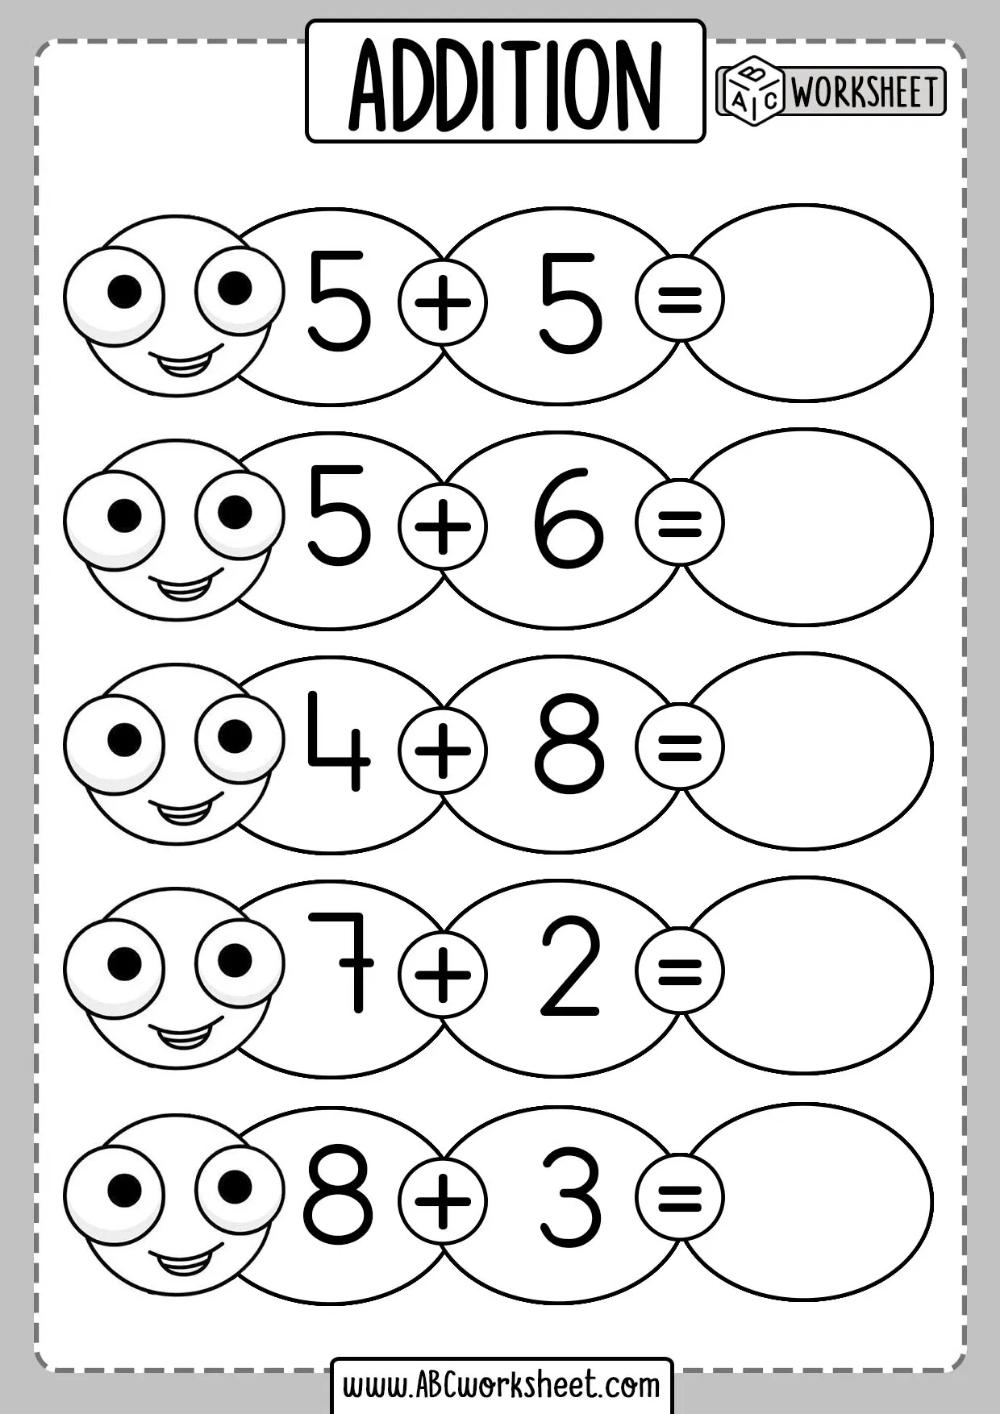 hight resolution of Addition Sums For Grade Kids Worksheet   Addition worksheets